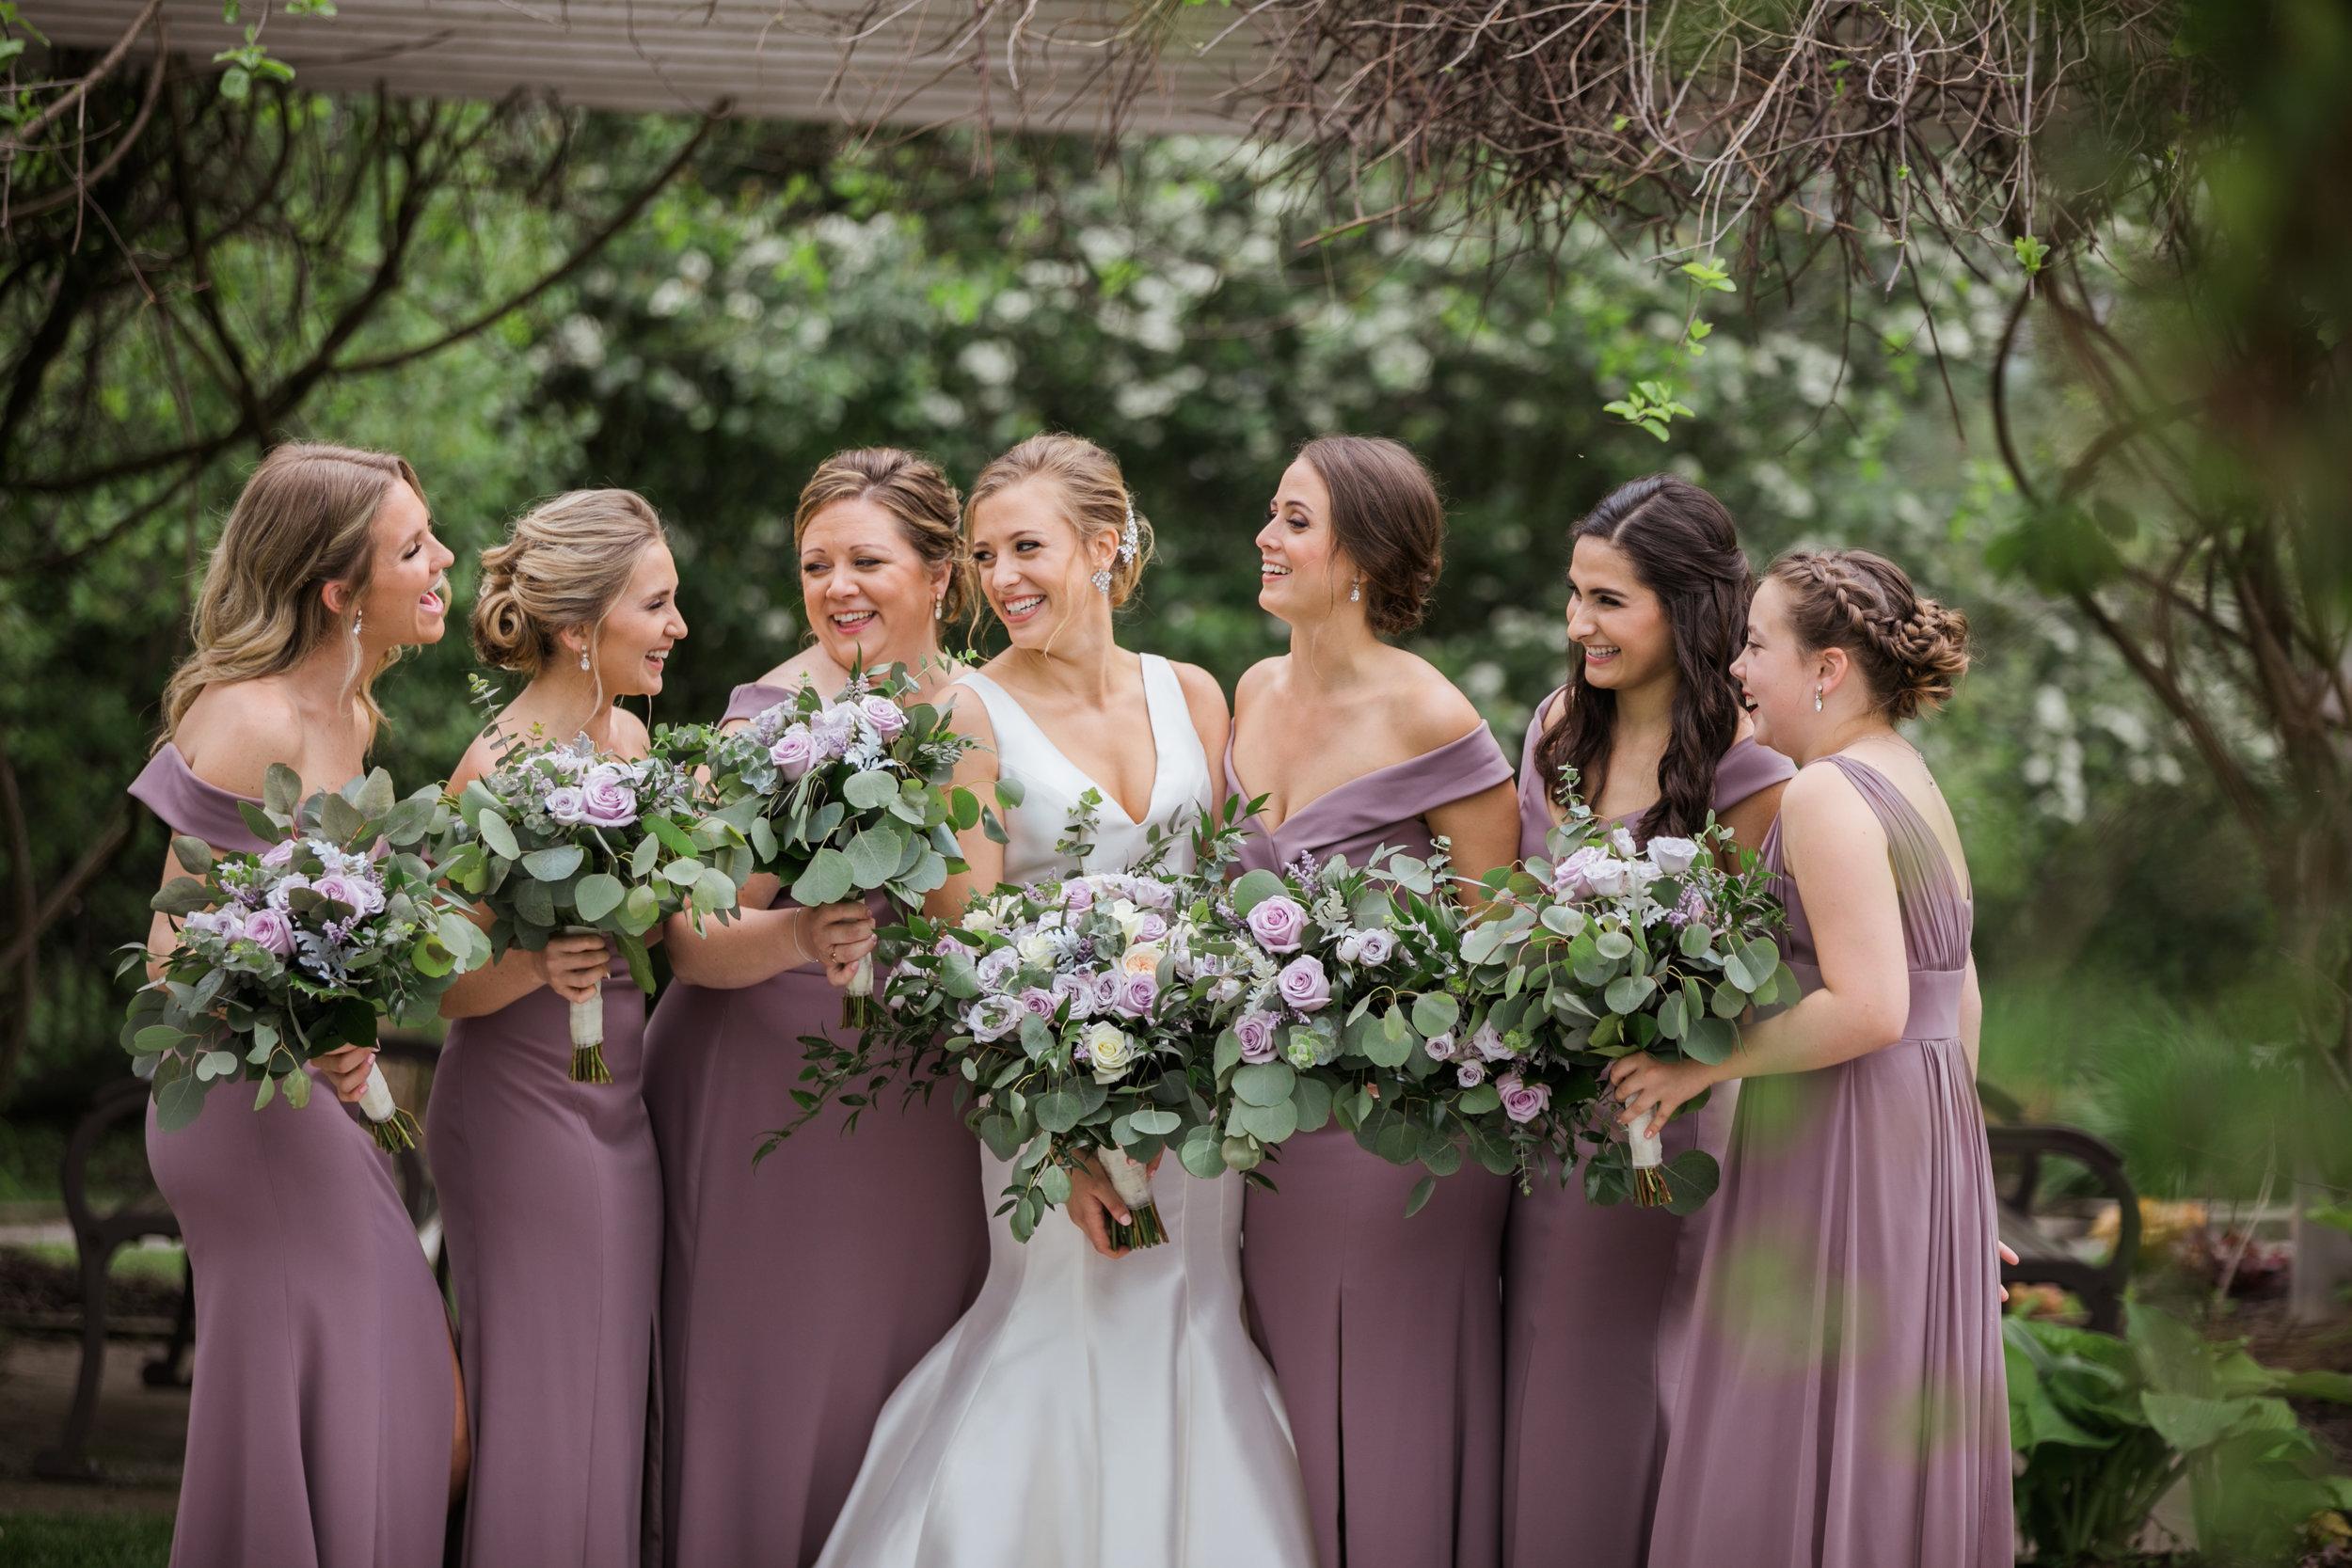 Bridesmaids-cute-wedding-poses-with-lauren-ashley-studios.jpg